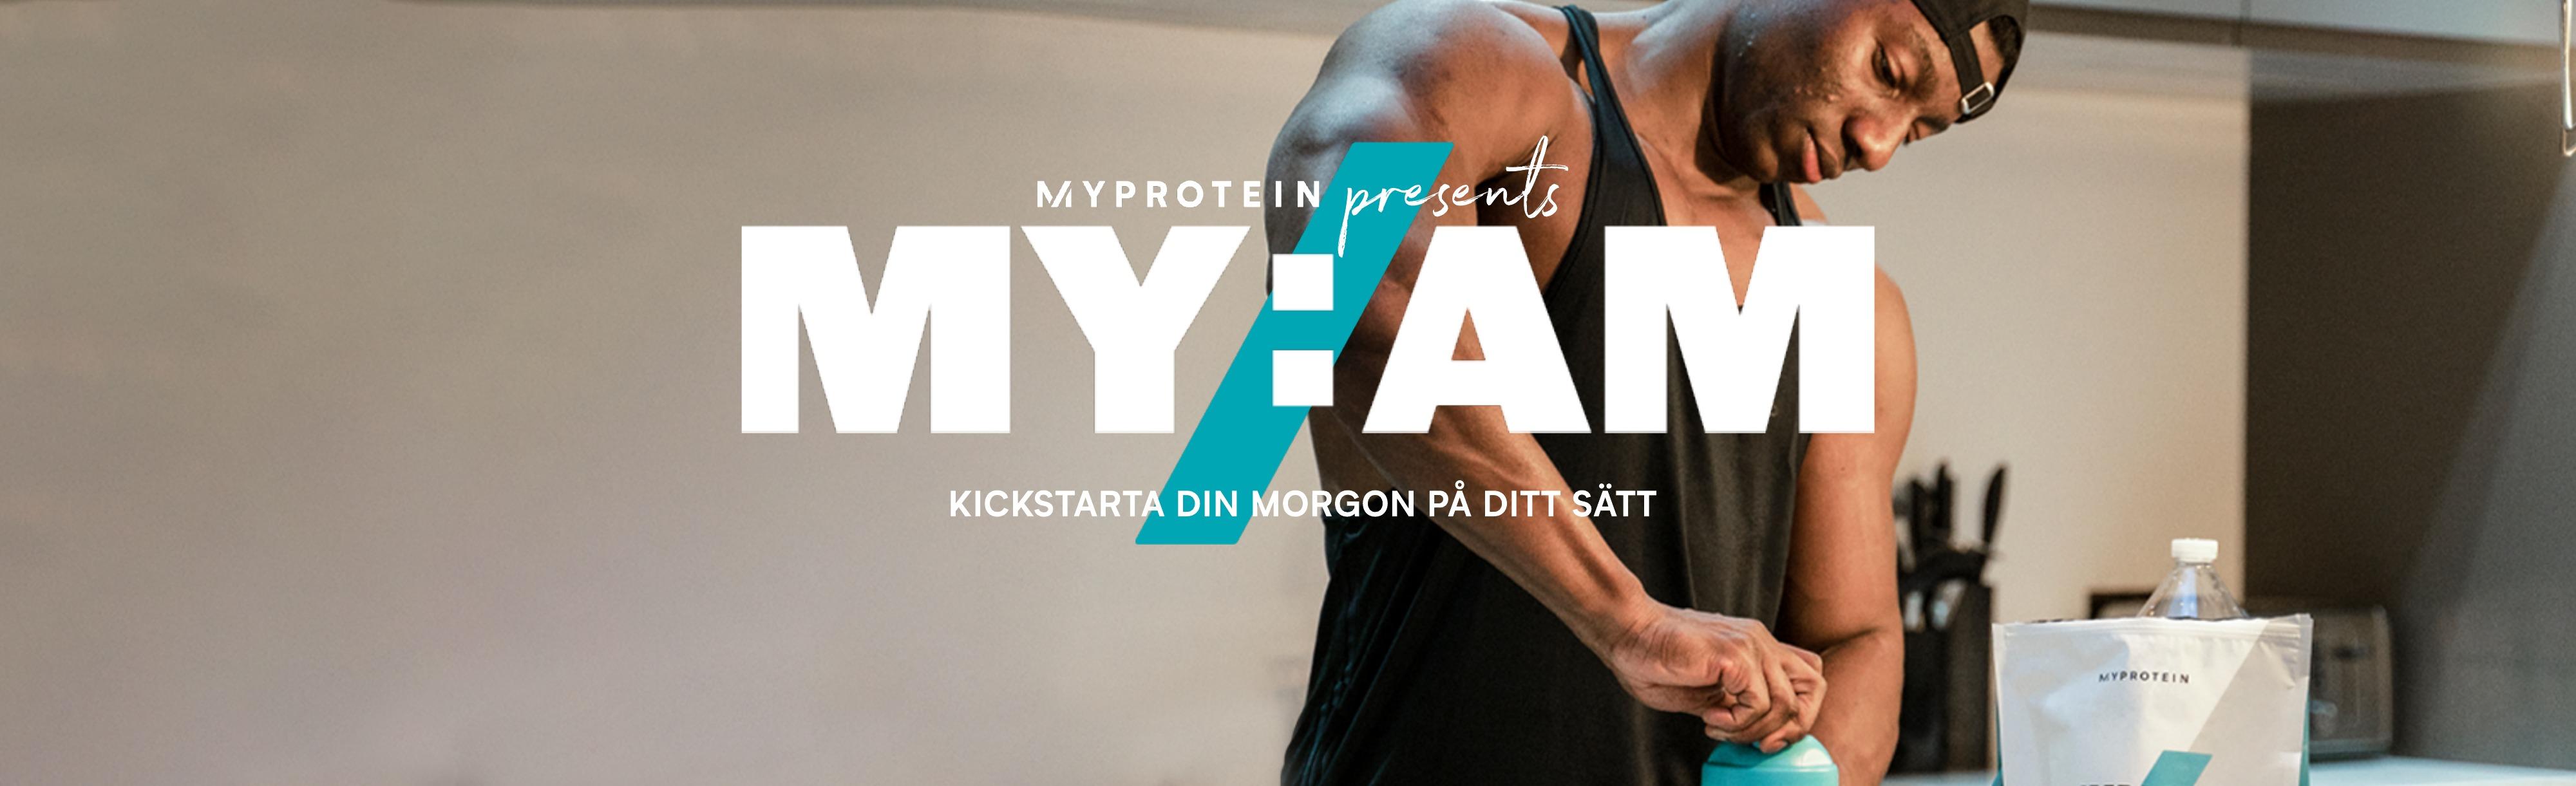 MY:AM - EN BRA START PÅ MORGONEN